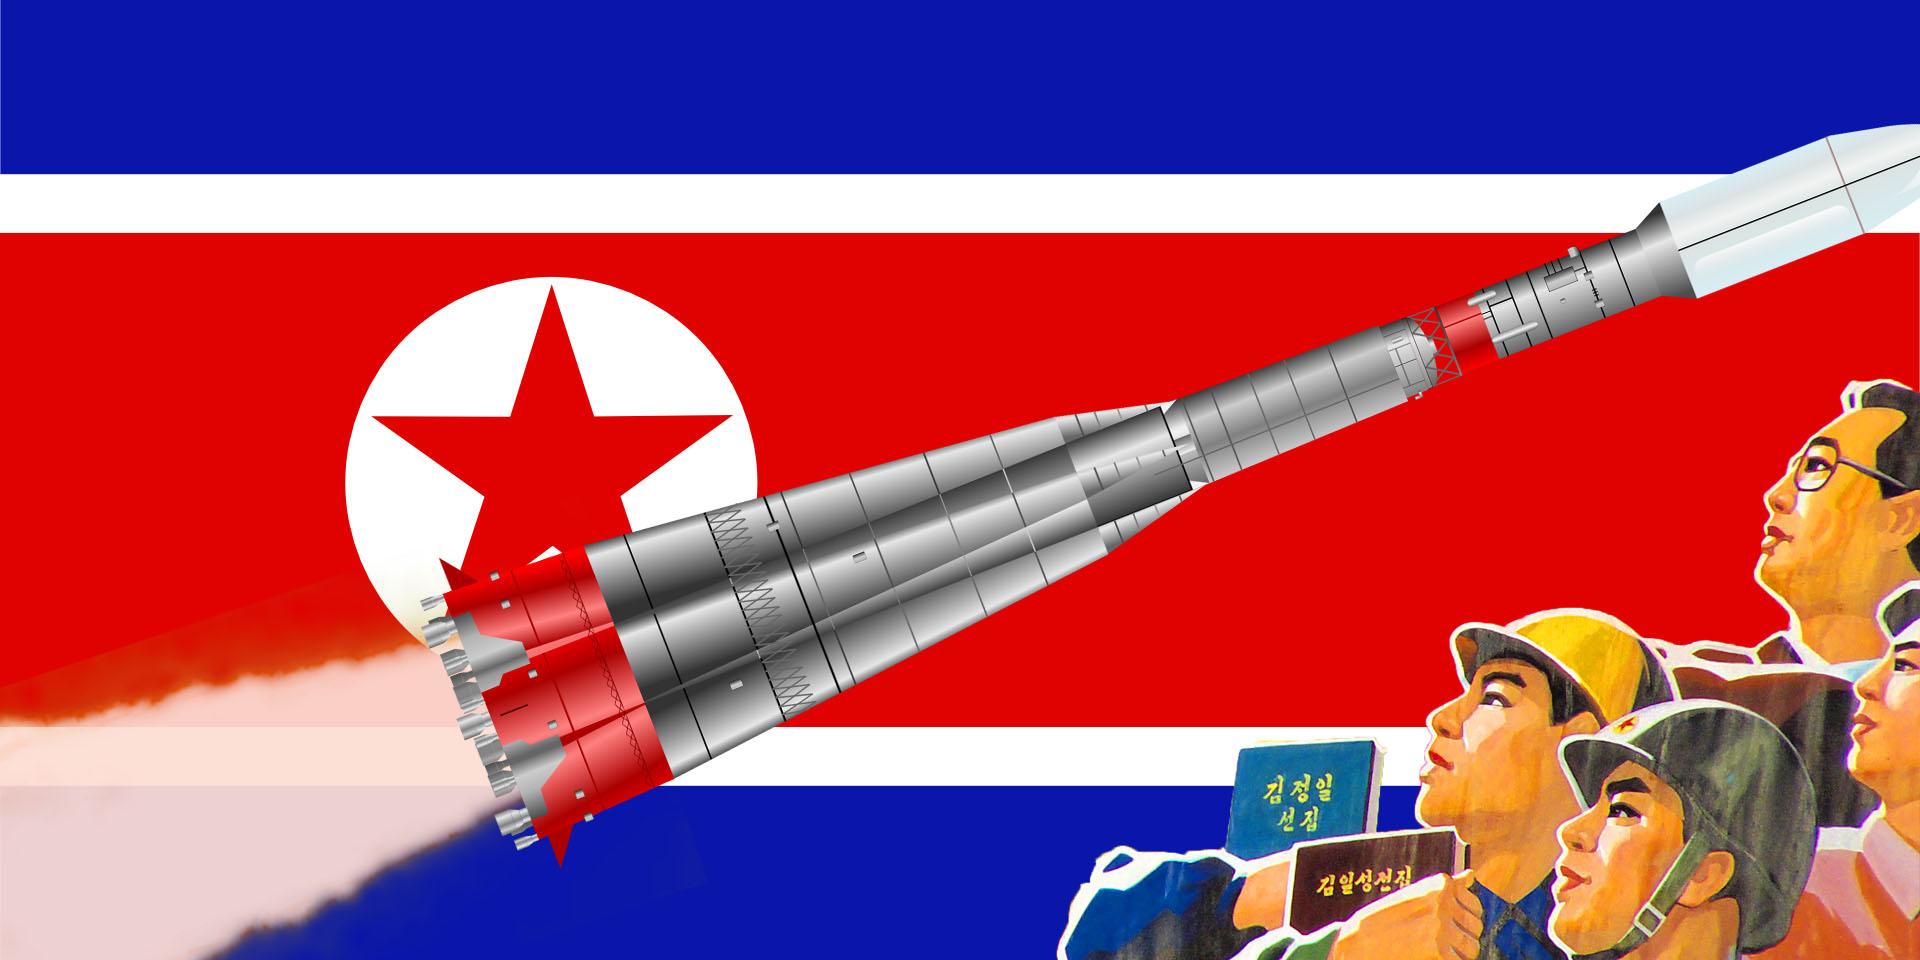 nk-rocket-2.jpg